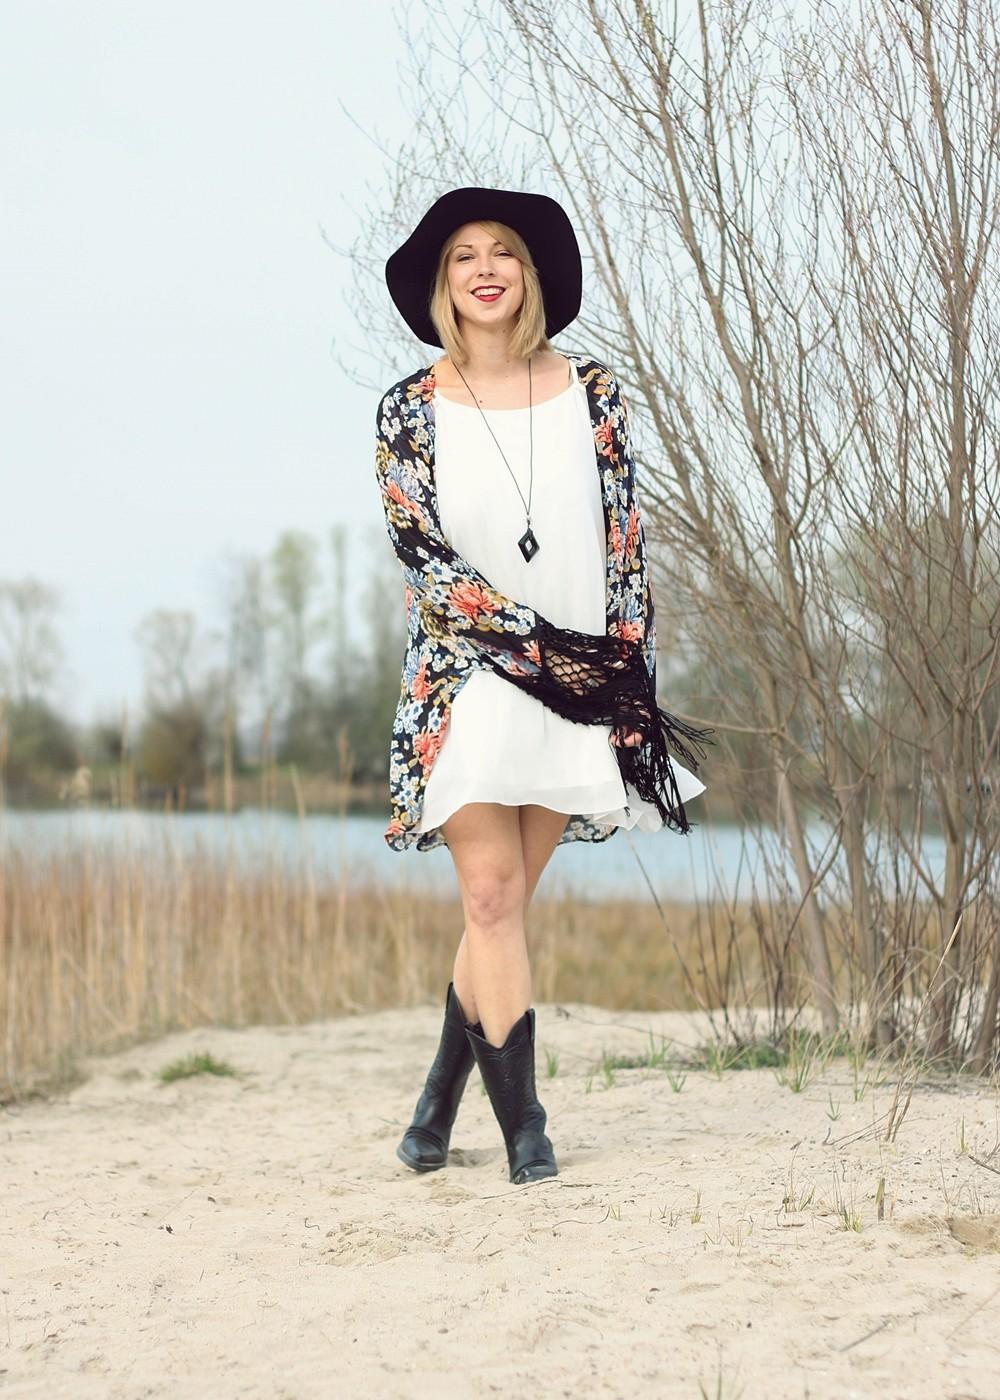 Fashionblogger Outfit Kimono weisses Kleid Cowboystiefel Schlapphut (8)